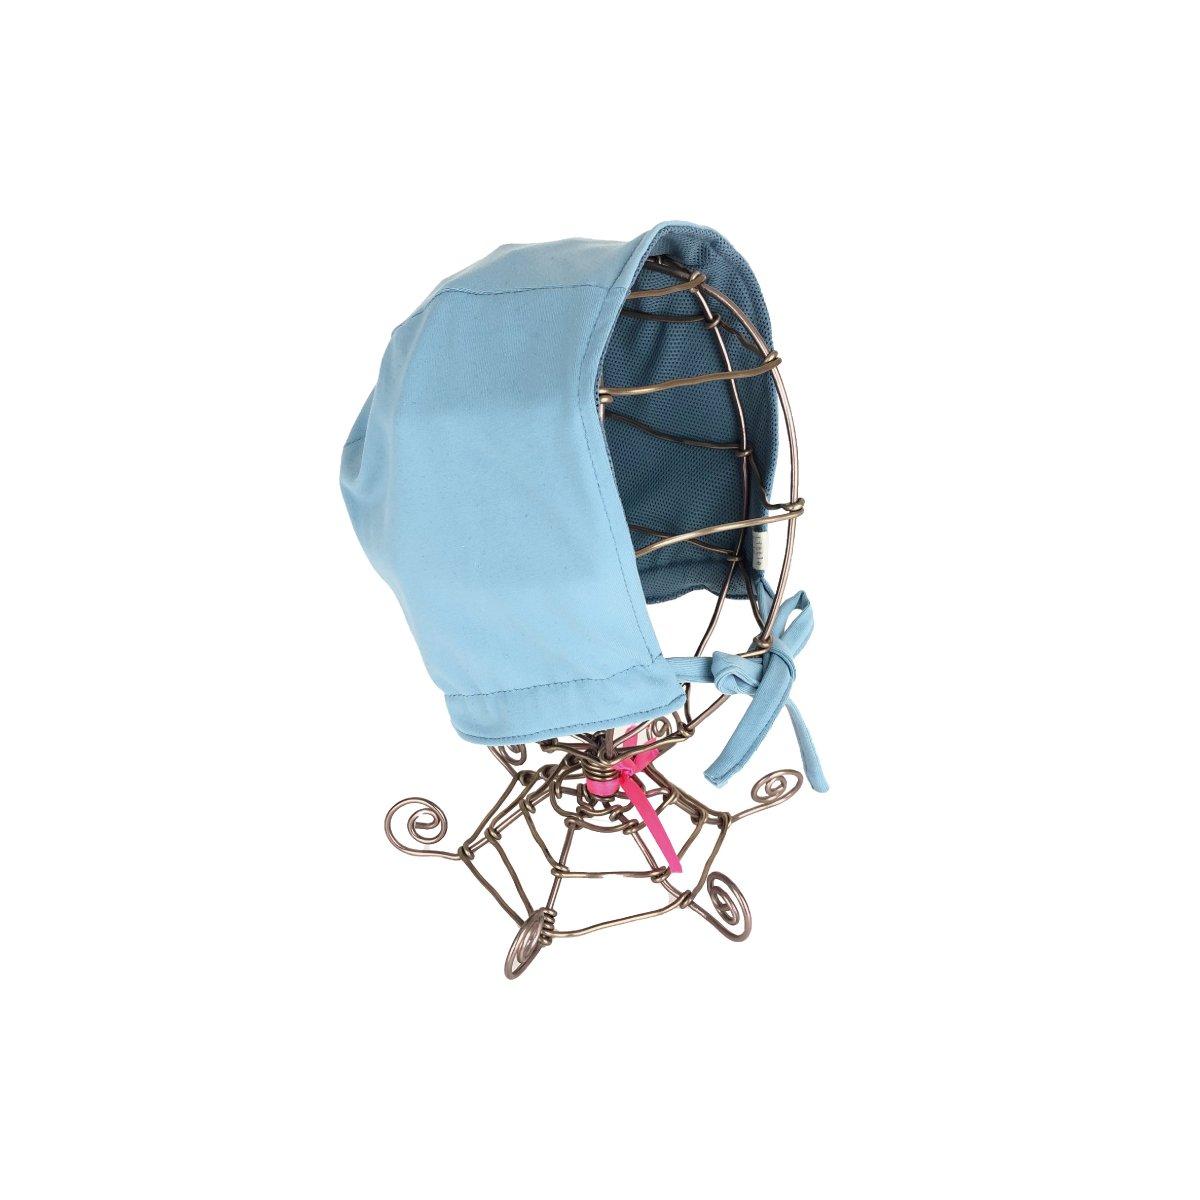 【BABY】Candy Bonnet 詳細画像11